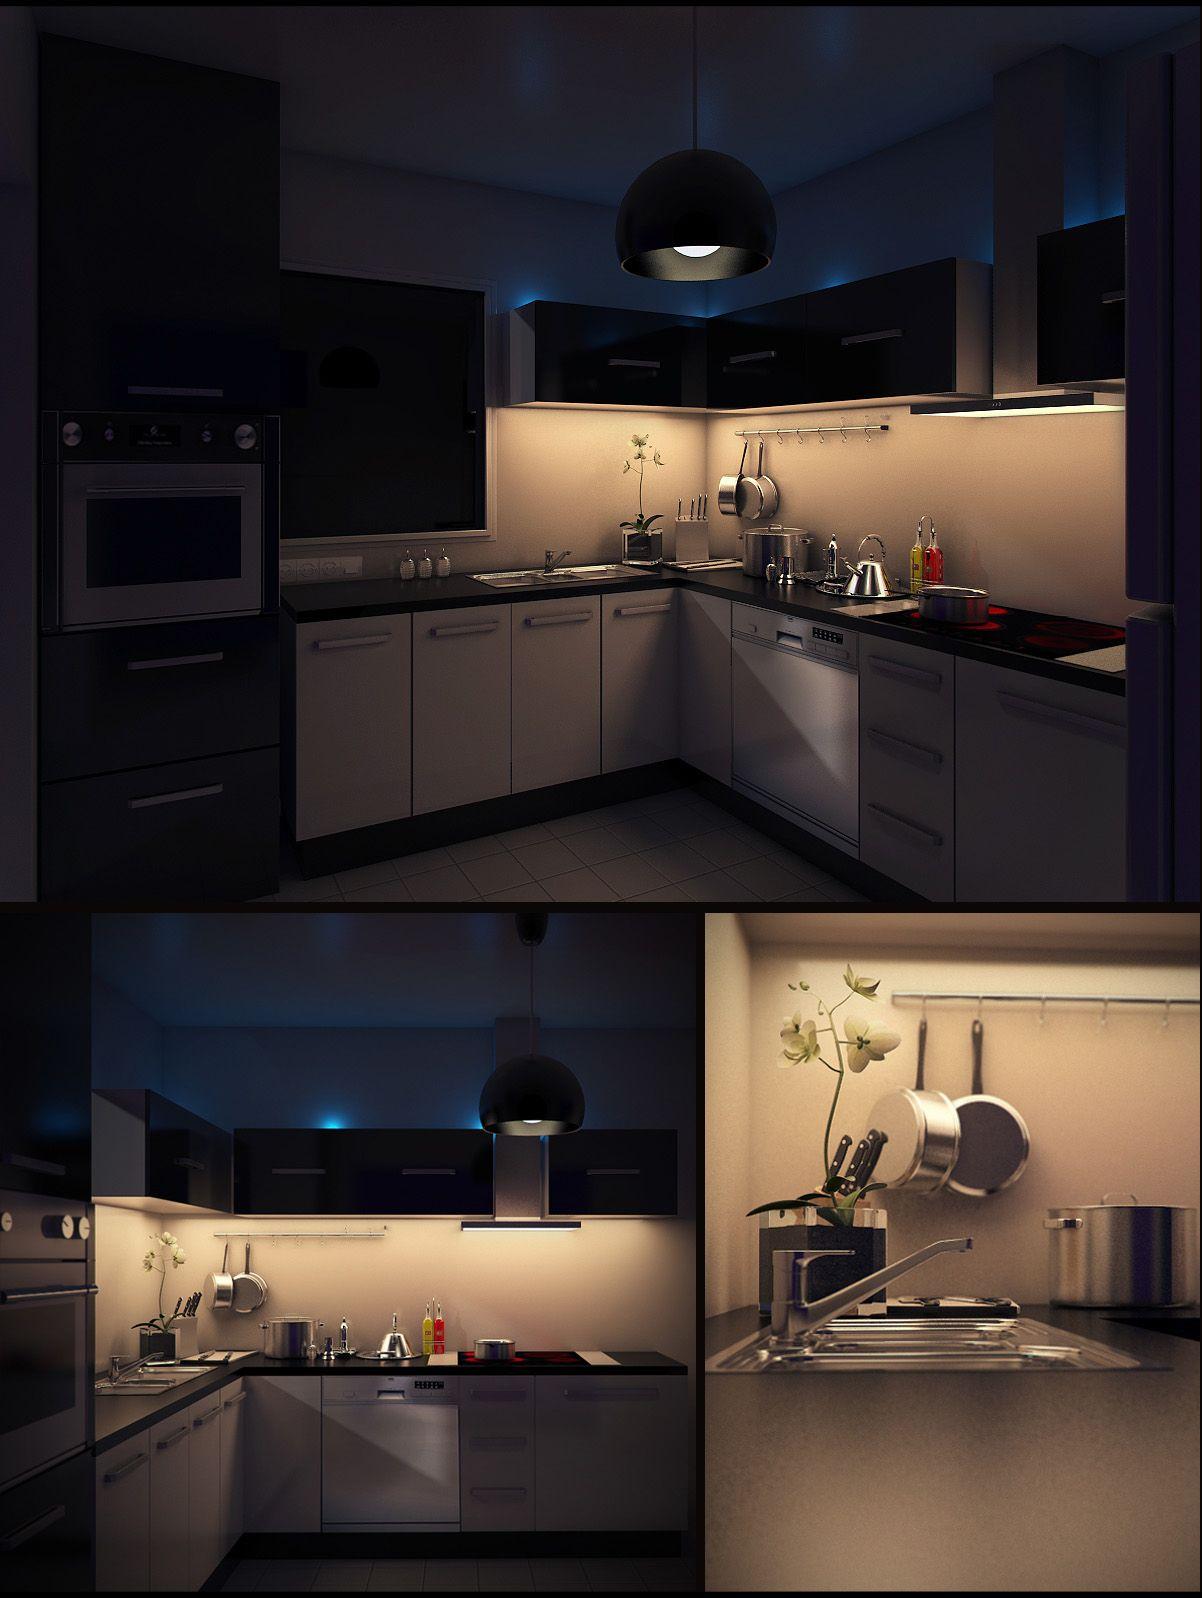 My Kitchen by BuGsY 3D Art Pinterest